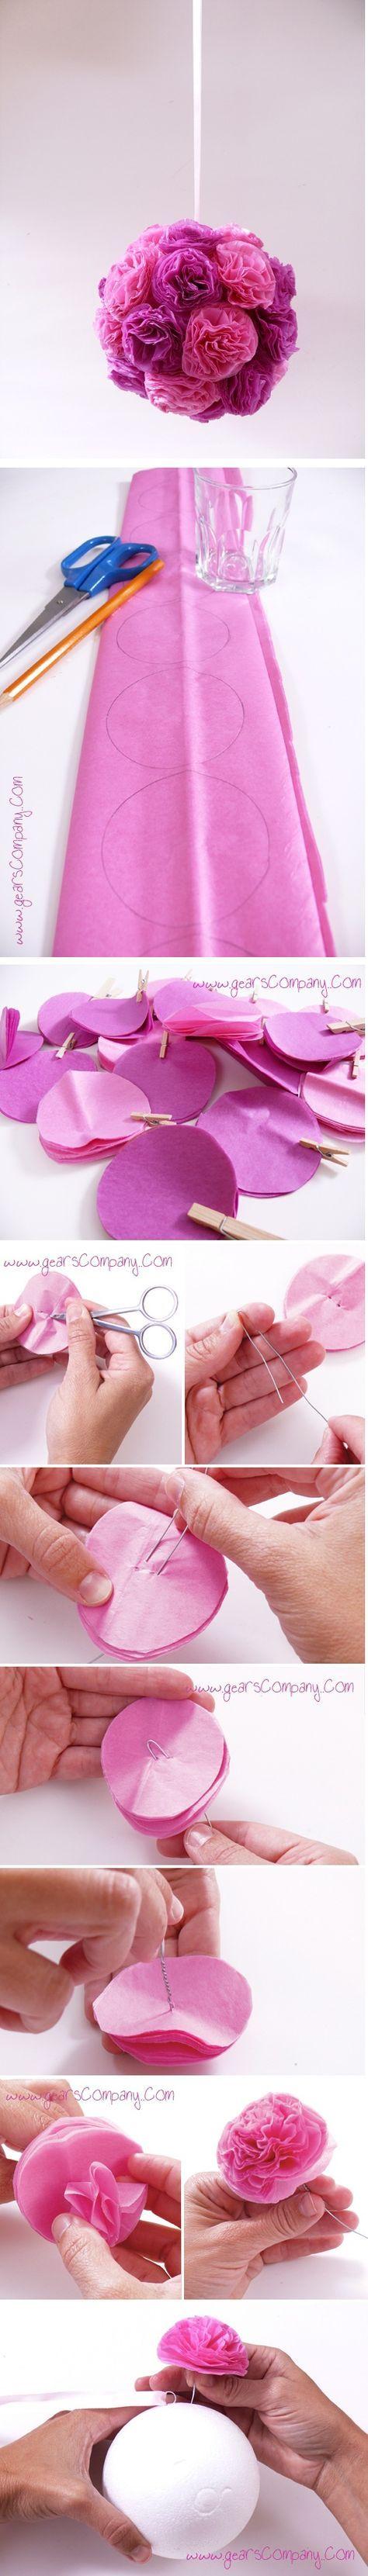 DIY paper- DIY papieren bol/rozetten